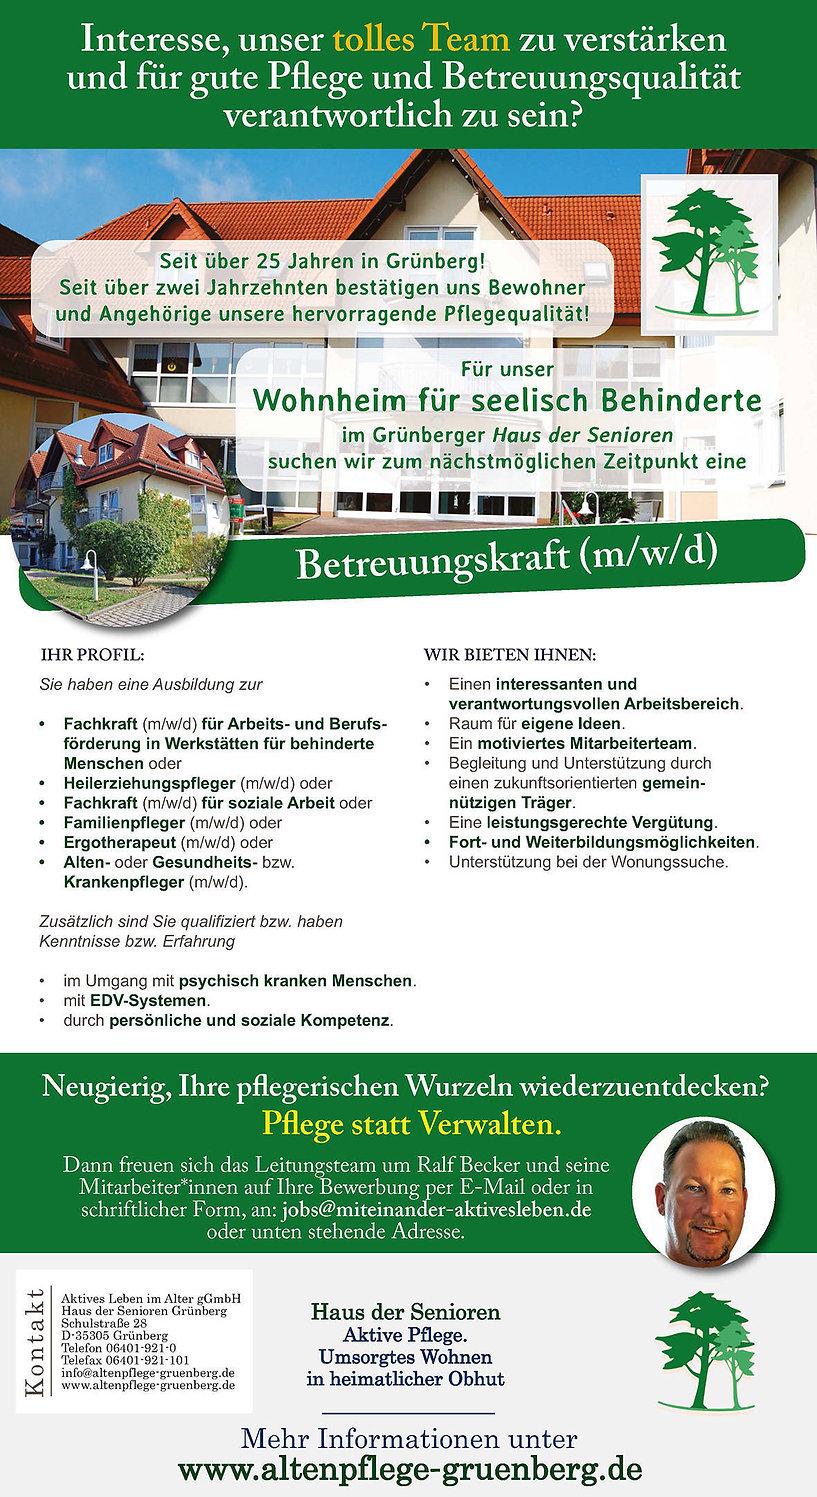 HdS_WohnheimfsB_122019_V2_web.jpg